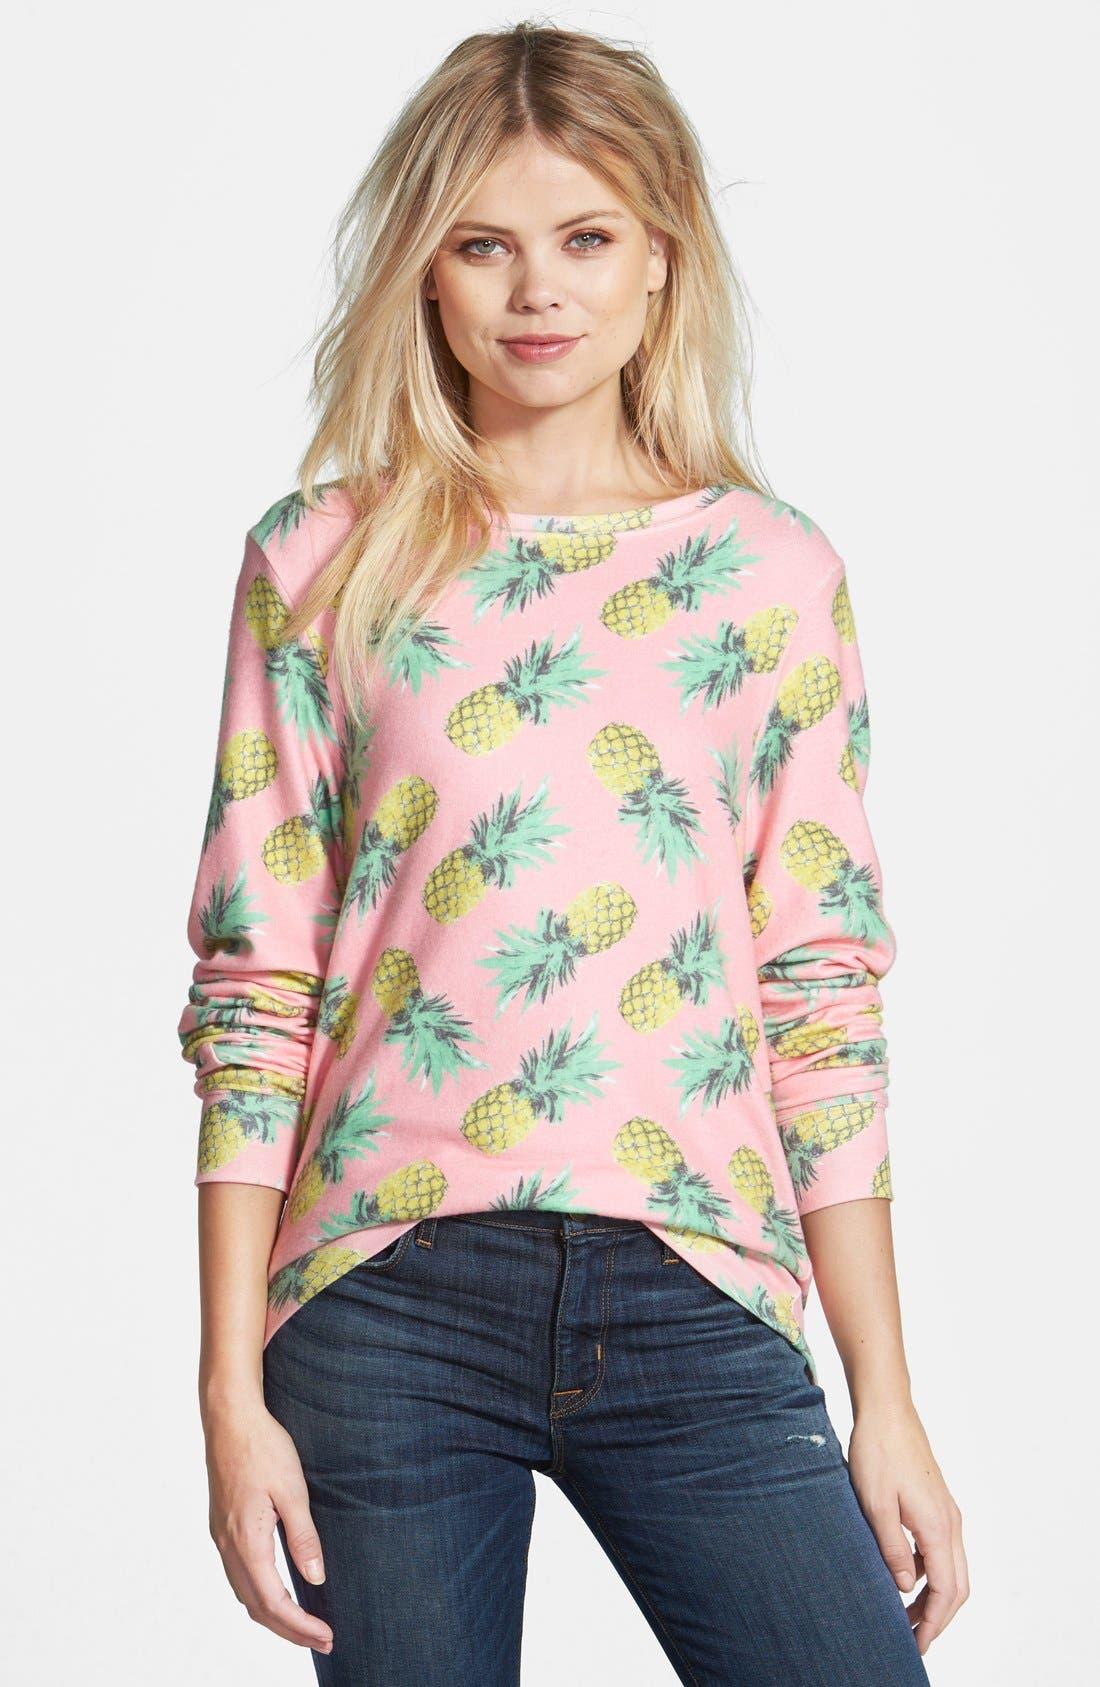 Alternate Image 1 Selected - Wildfox 'Pineapple Palace' Sweatshirt